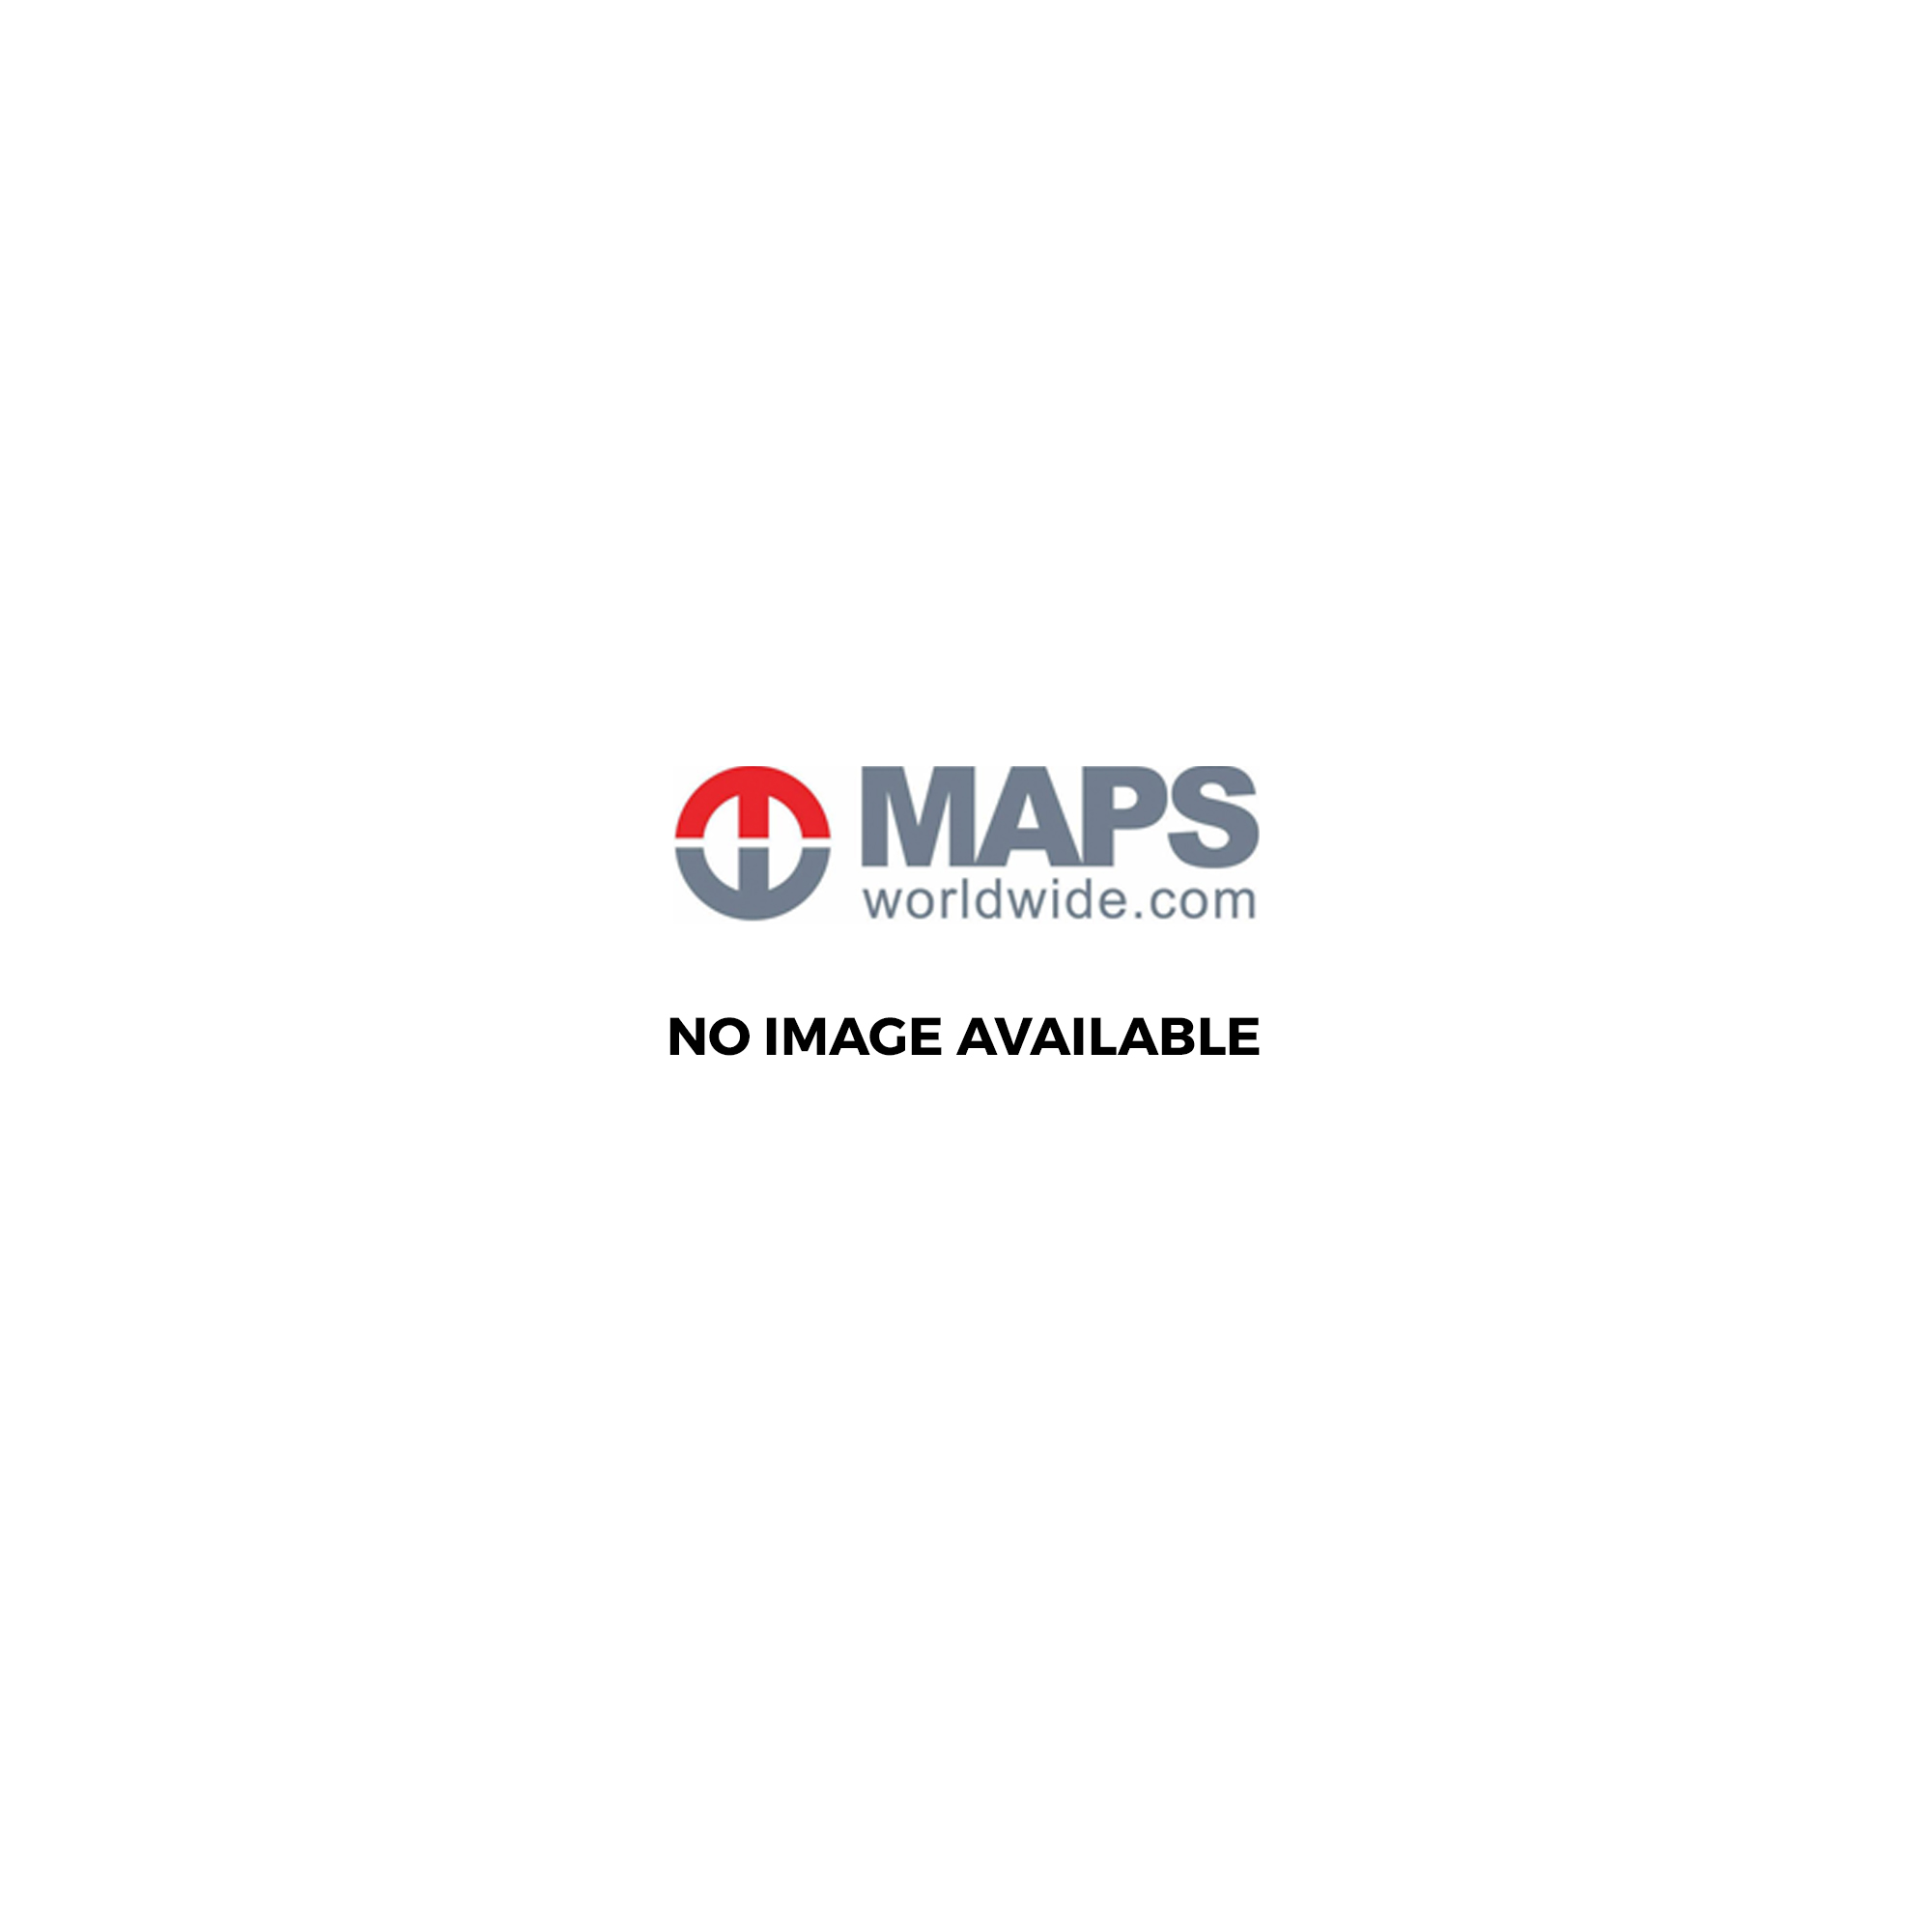 Map Of North Coast Of France.France North Road Map By K F Hallwag Kummerley Frey